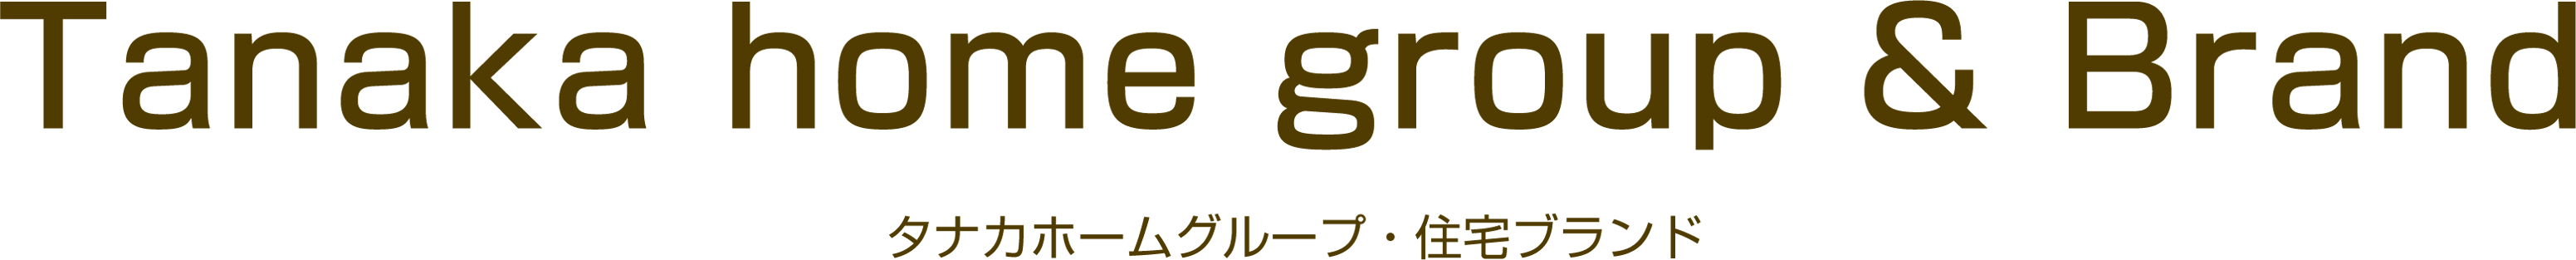 Tanaka home group & Brand